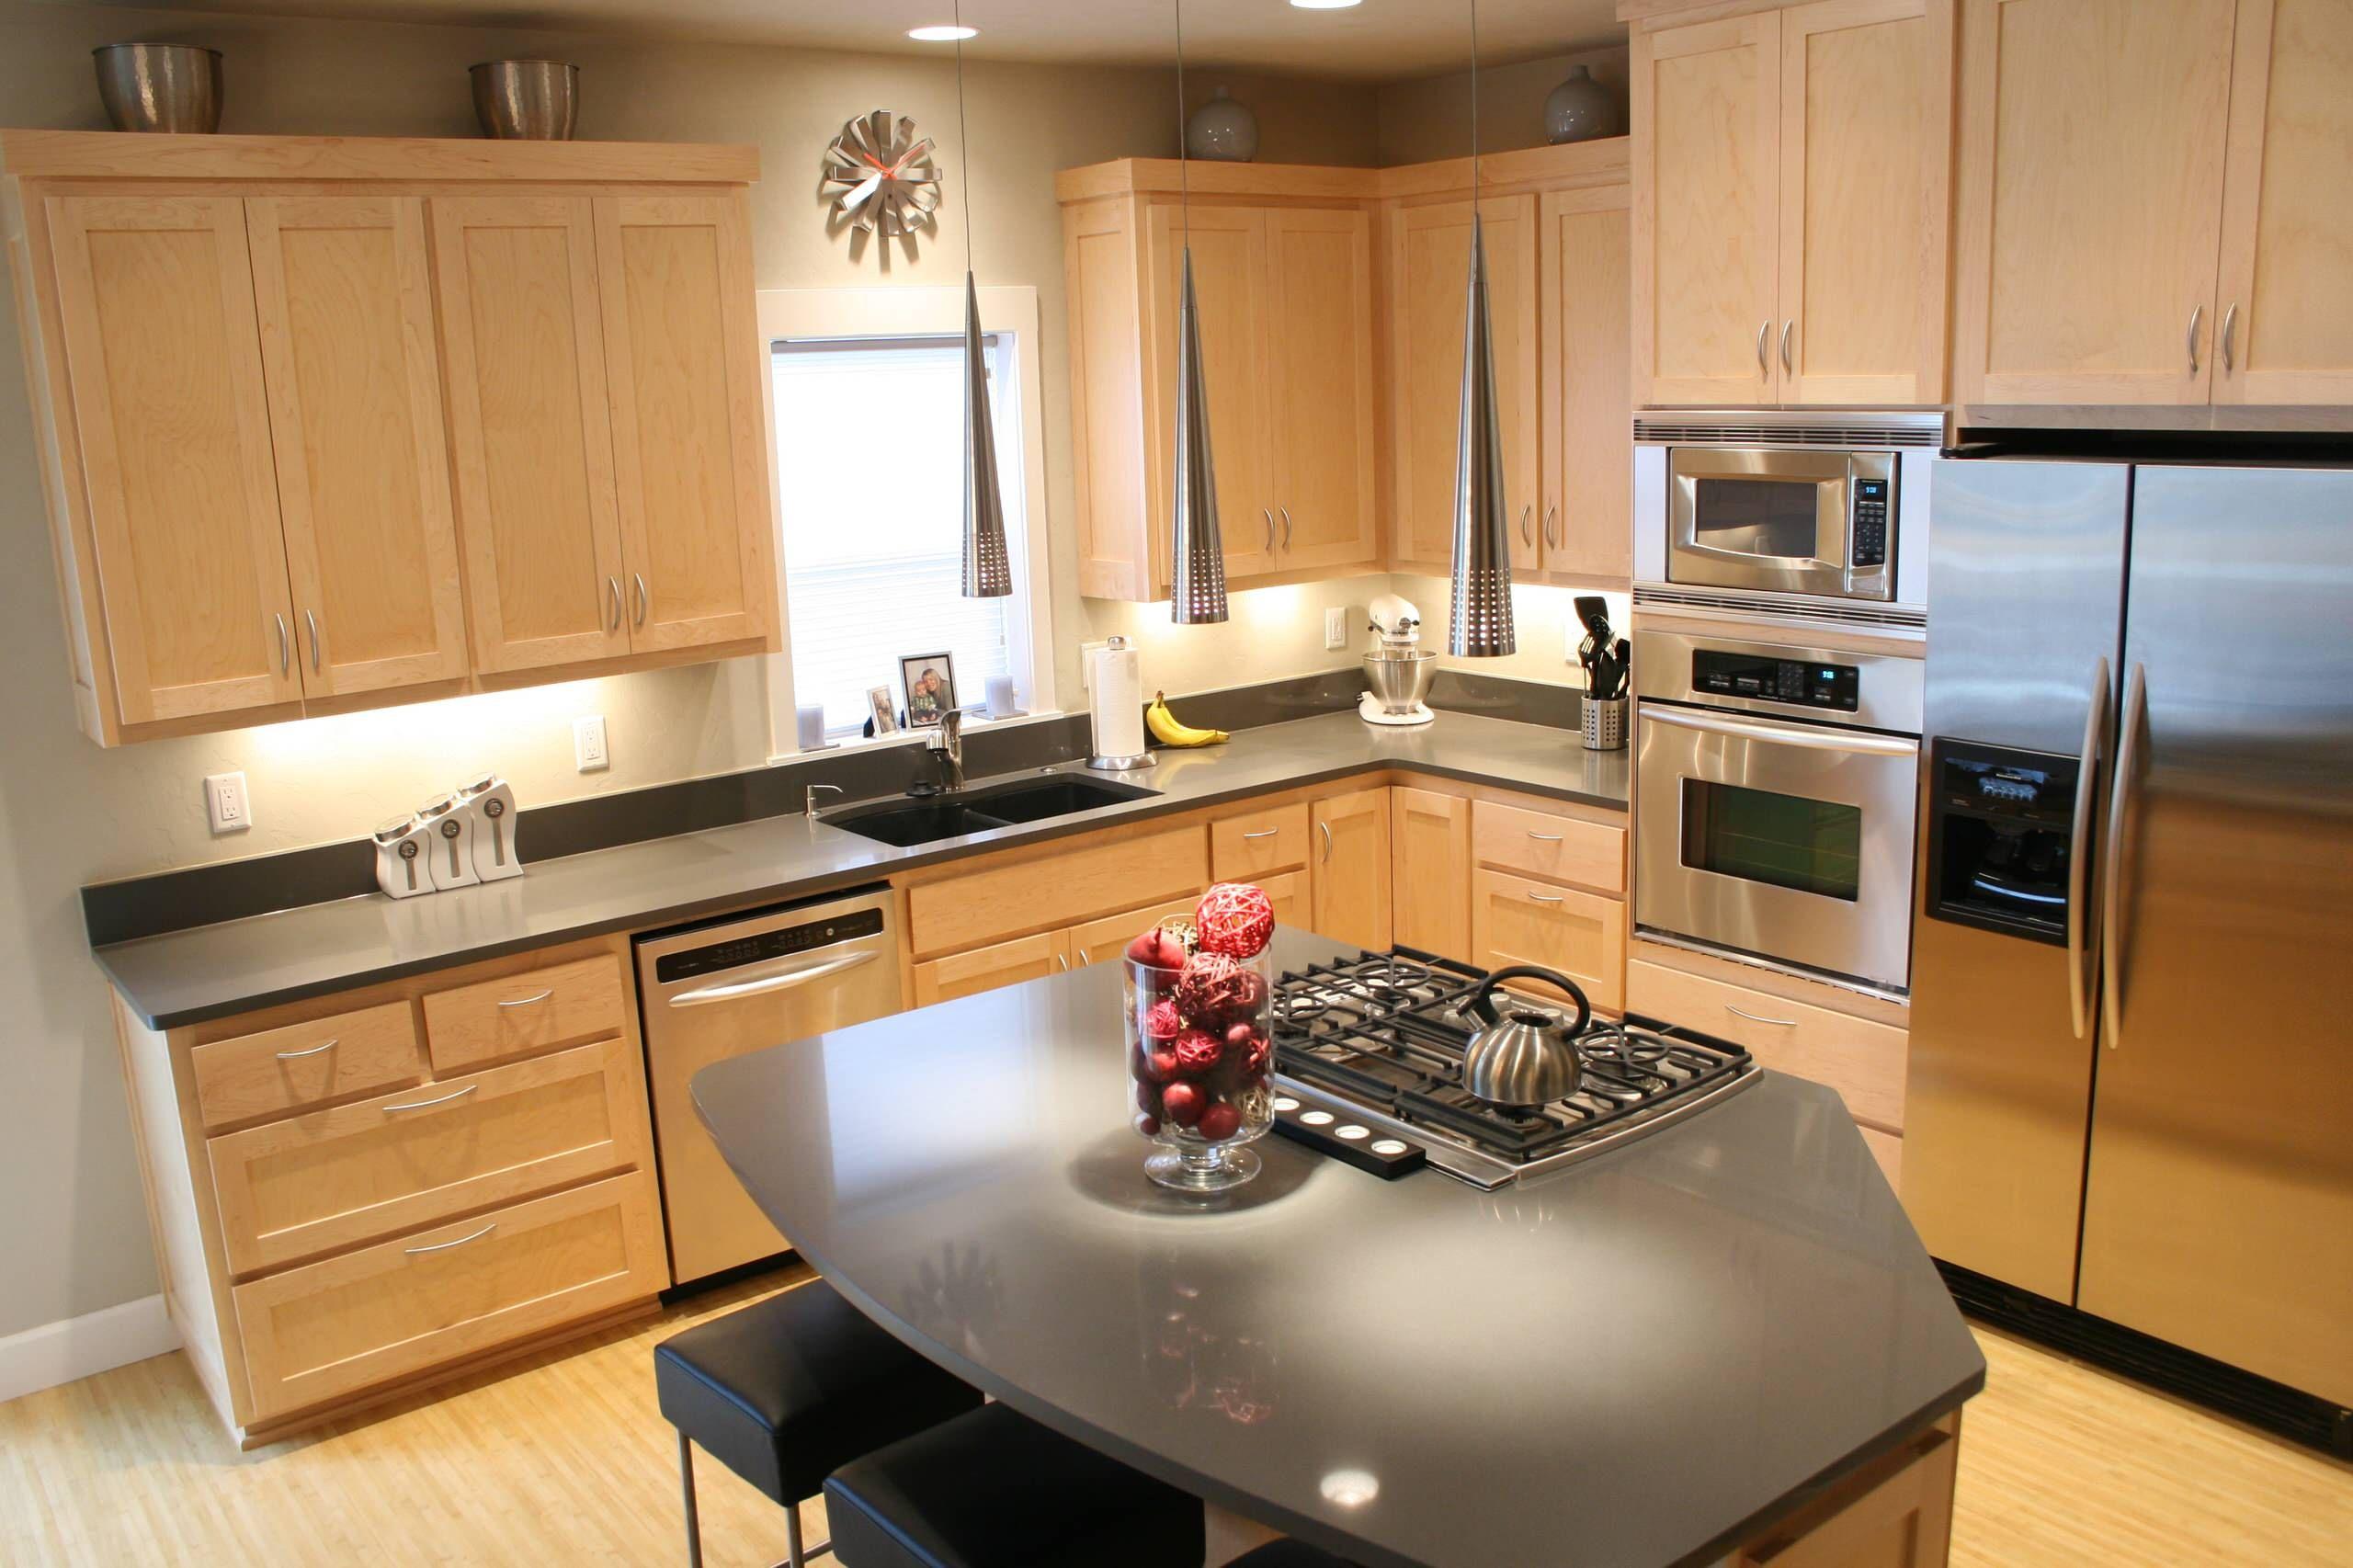 Trendy Pictures Of Quartz Countertops For Decorate Kitchen Ideas